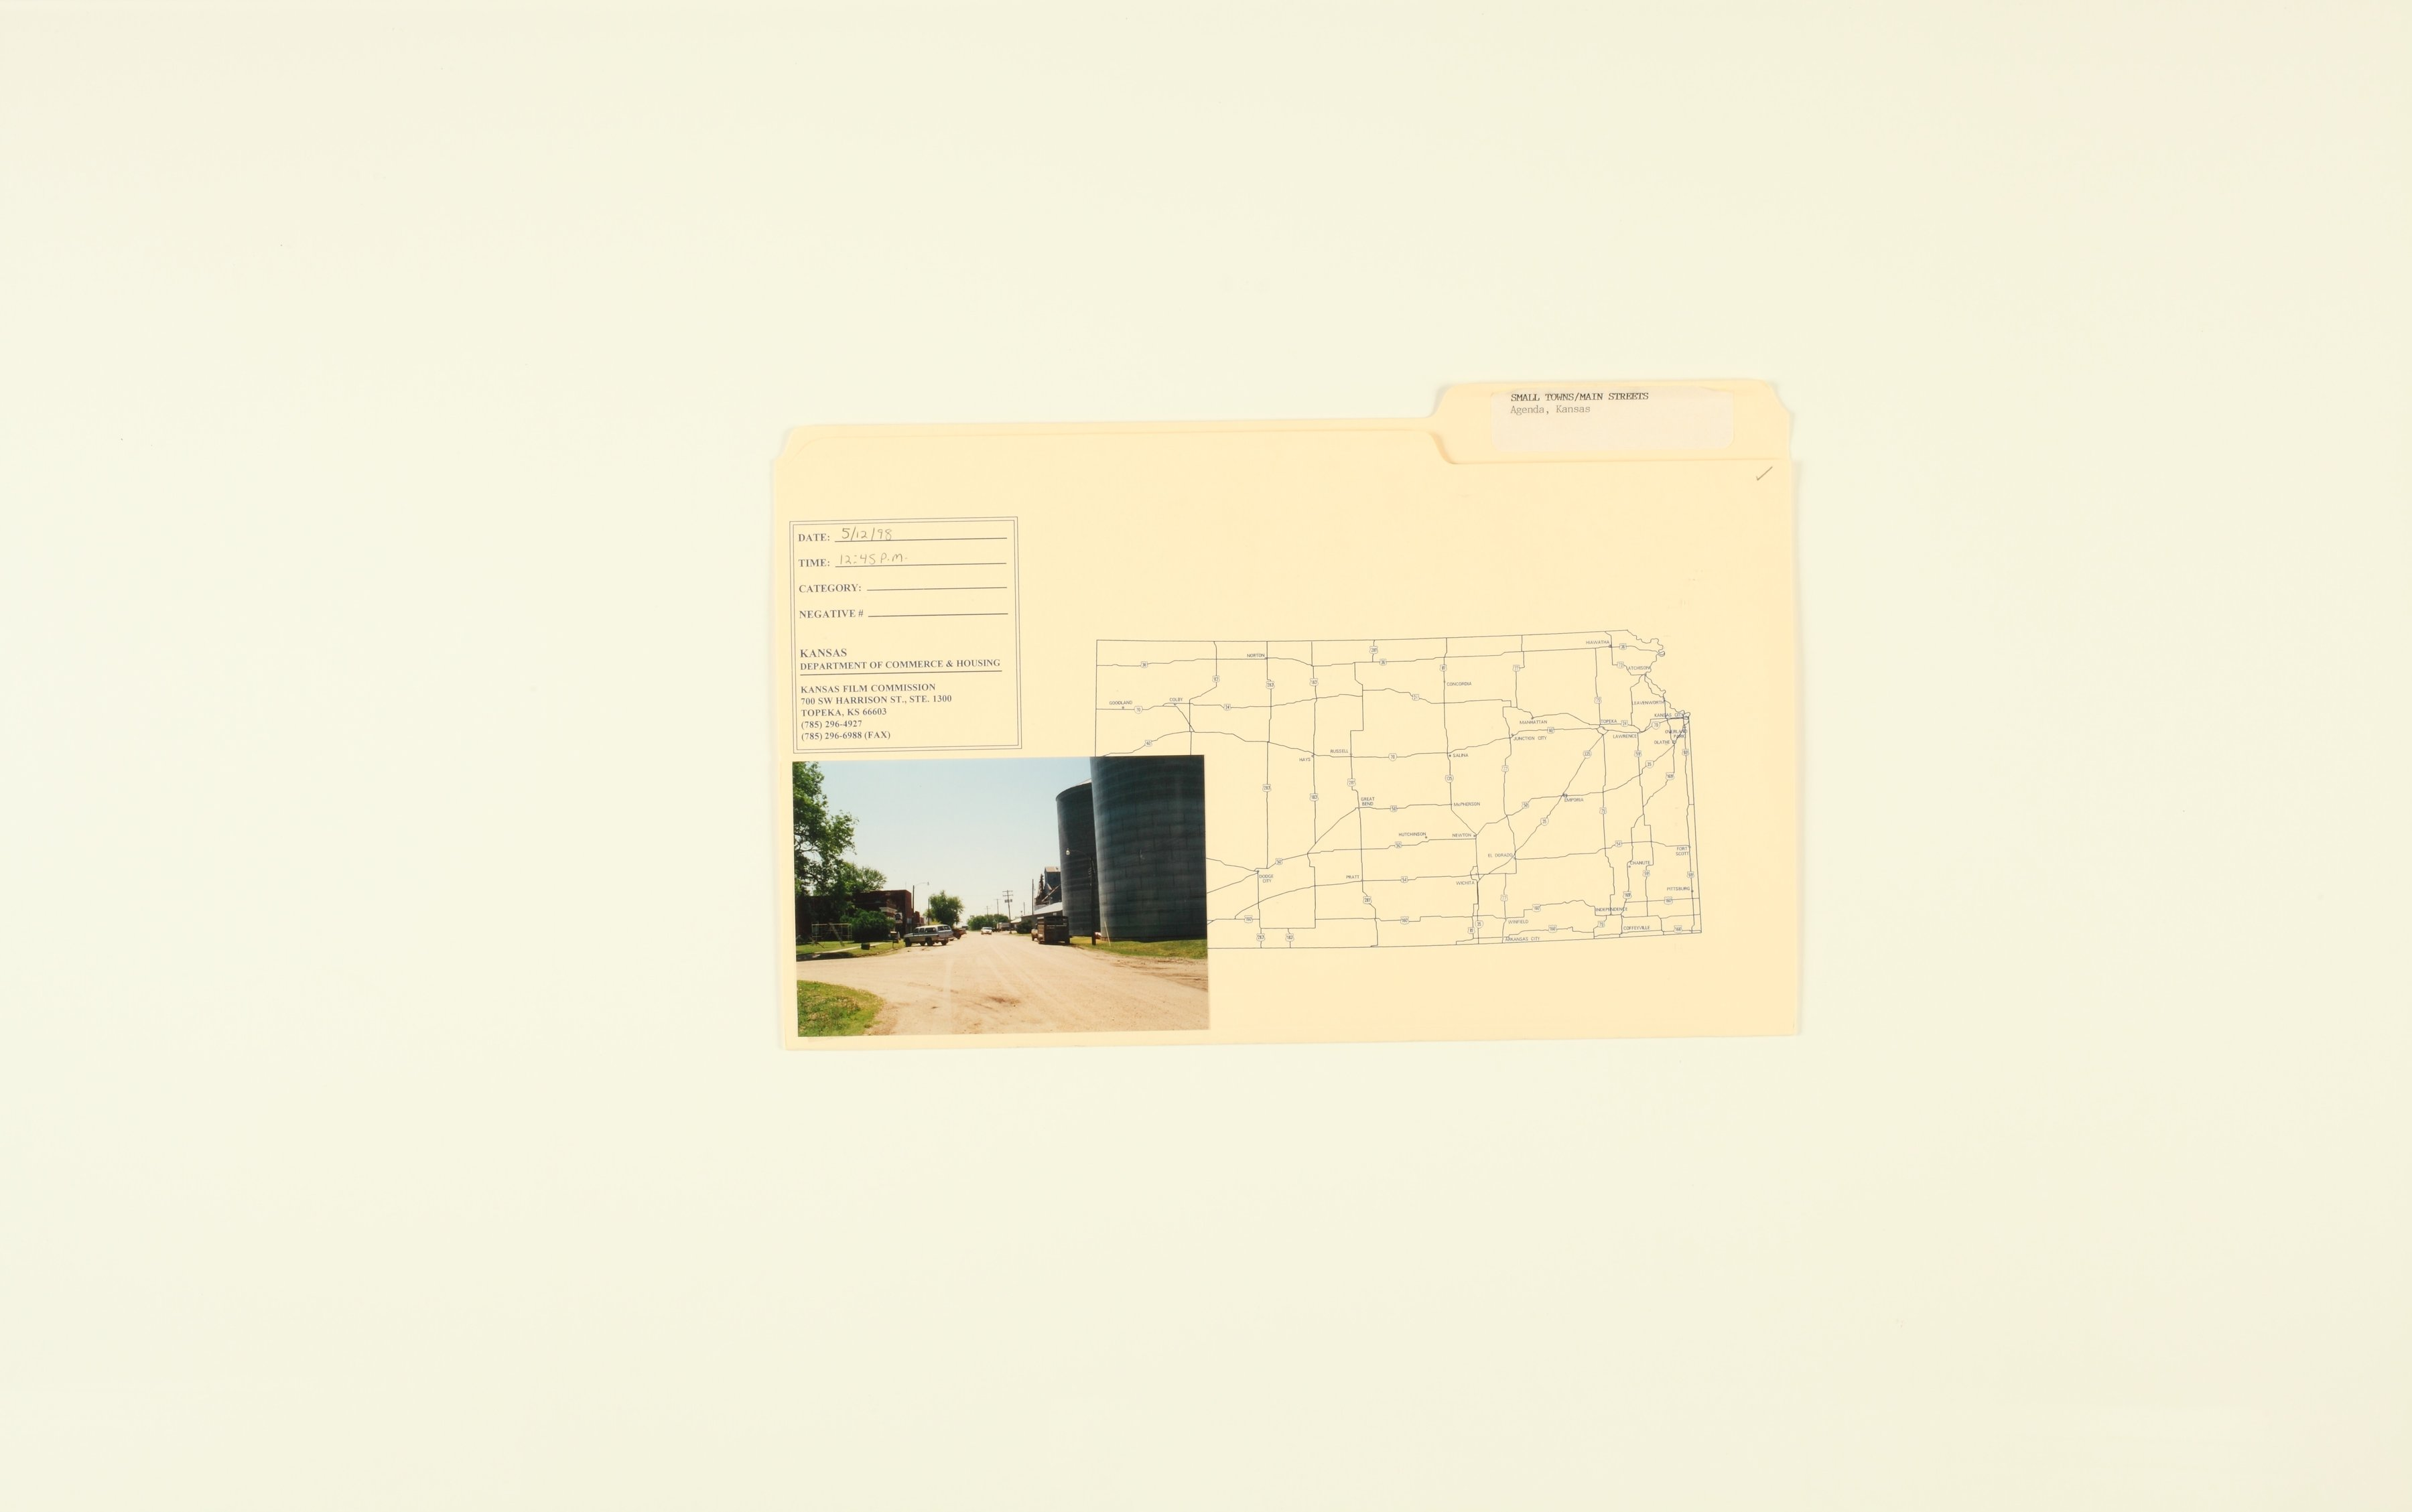 Kansas Film Commission site photographs, towns Ada - Bunker Hill - 5, Agenda